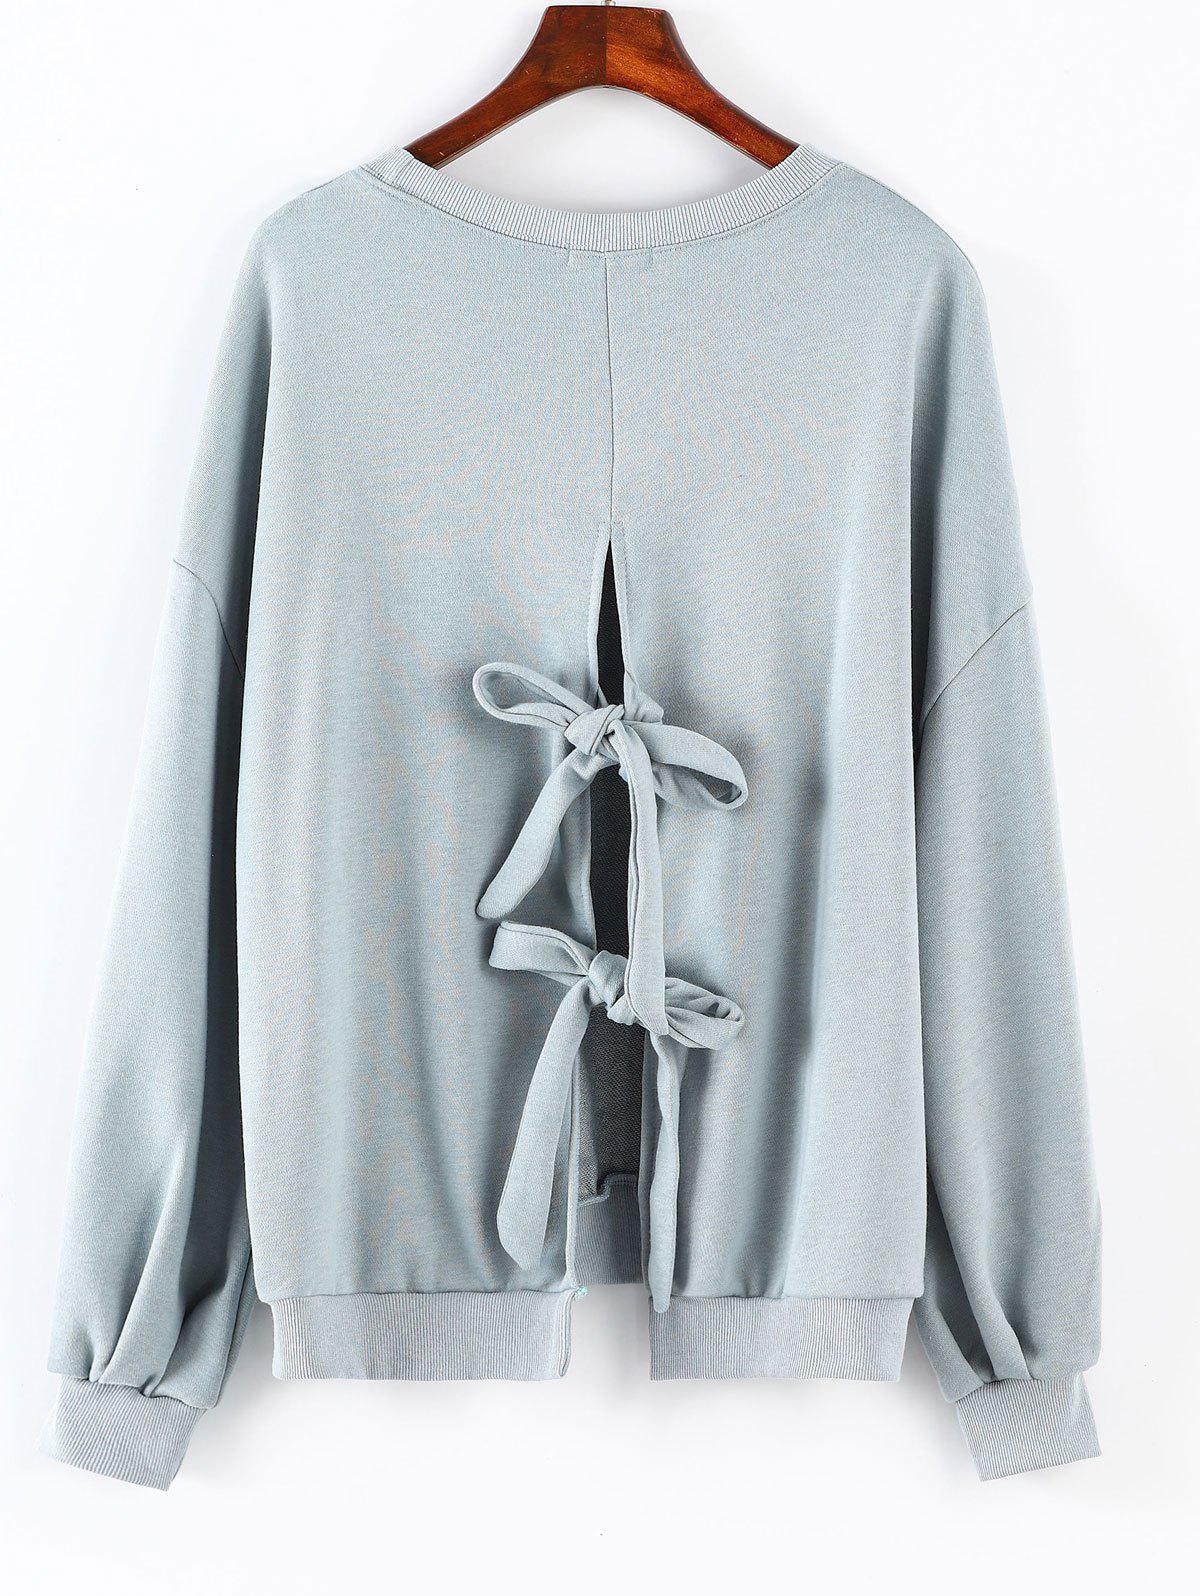 Round Neck Back Knotted Sweatshirt